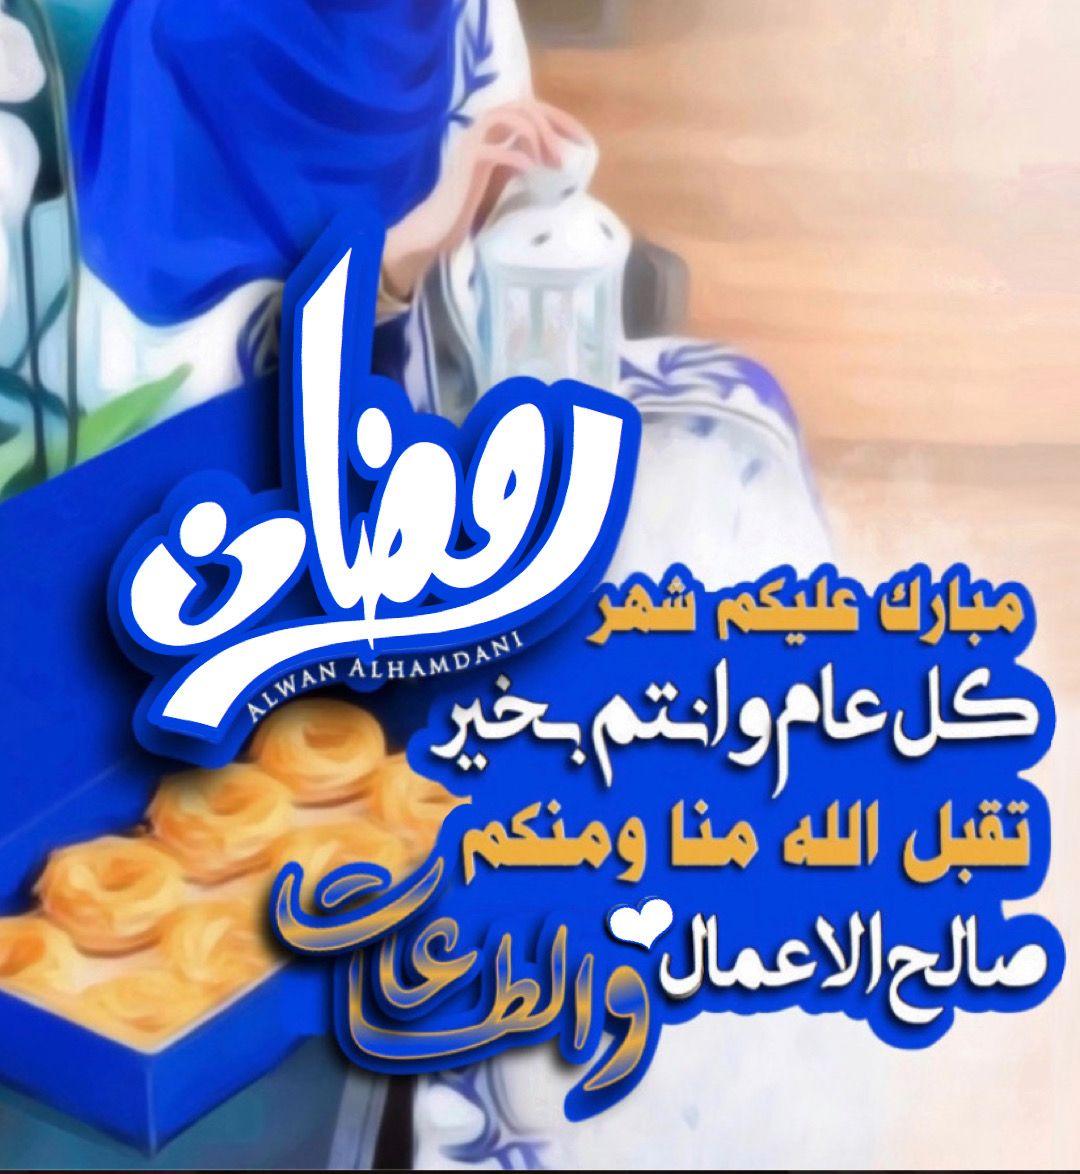 Pin By زهرة البنفسج On صور In 2021 Ramadan Kareem Ramadan Good Morning Gif